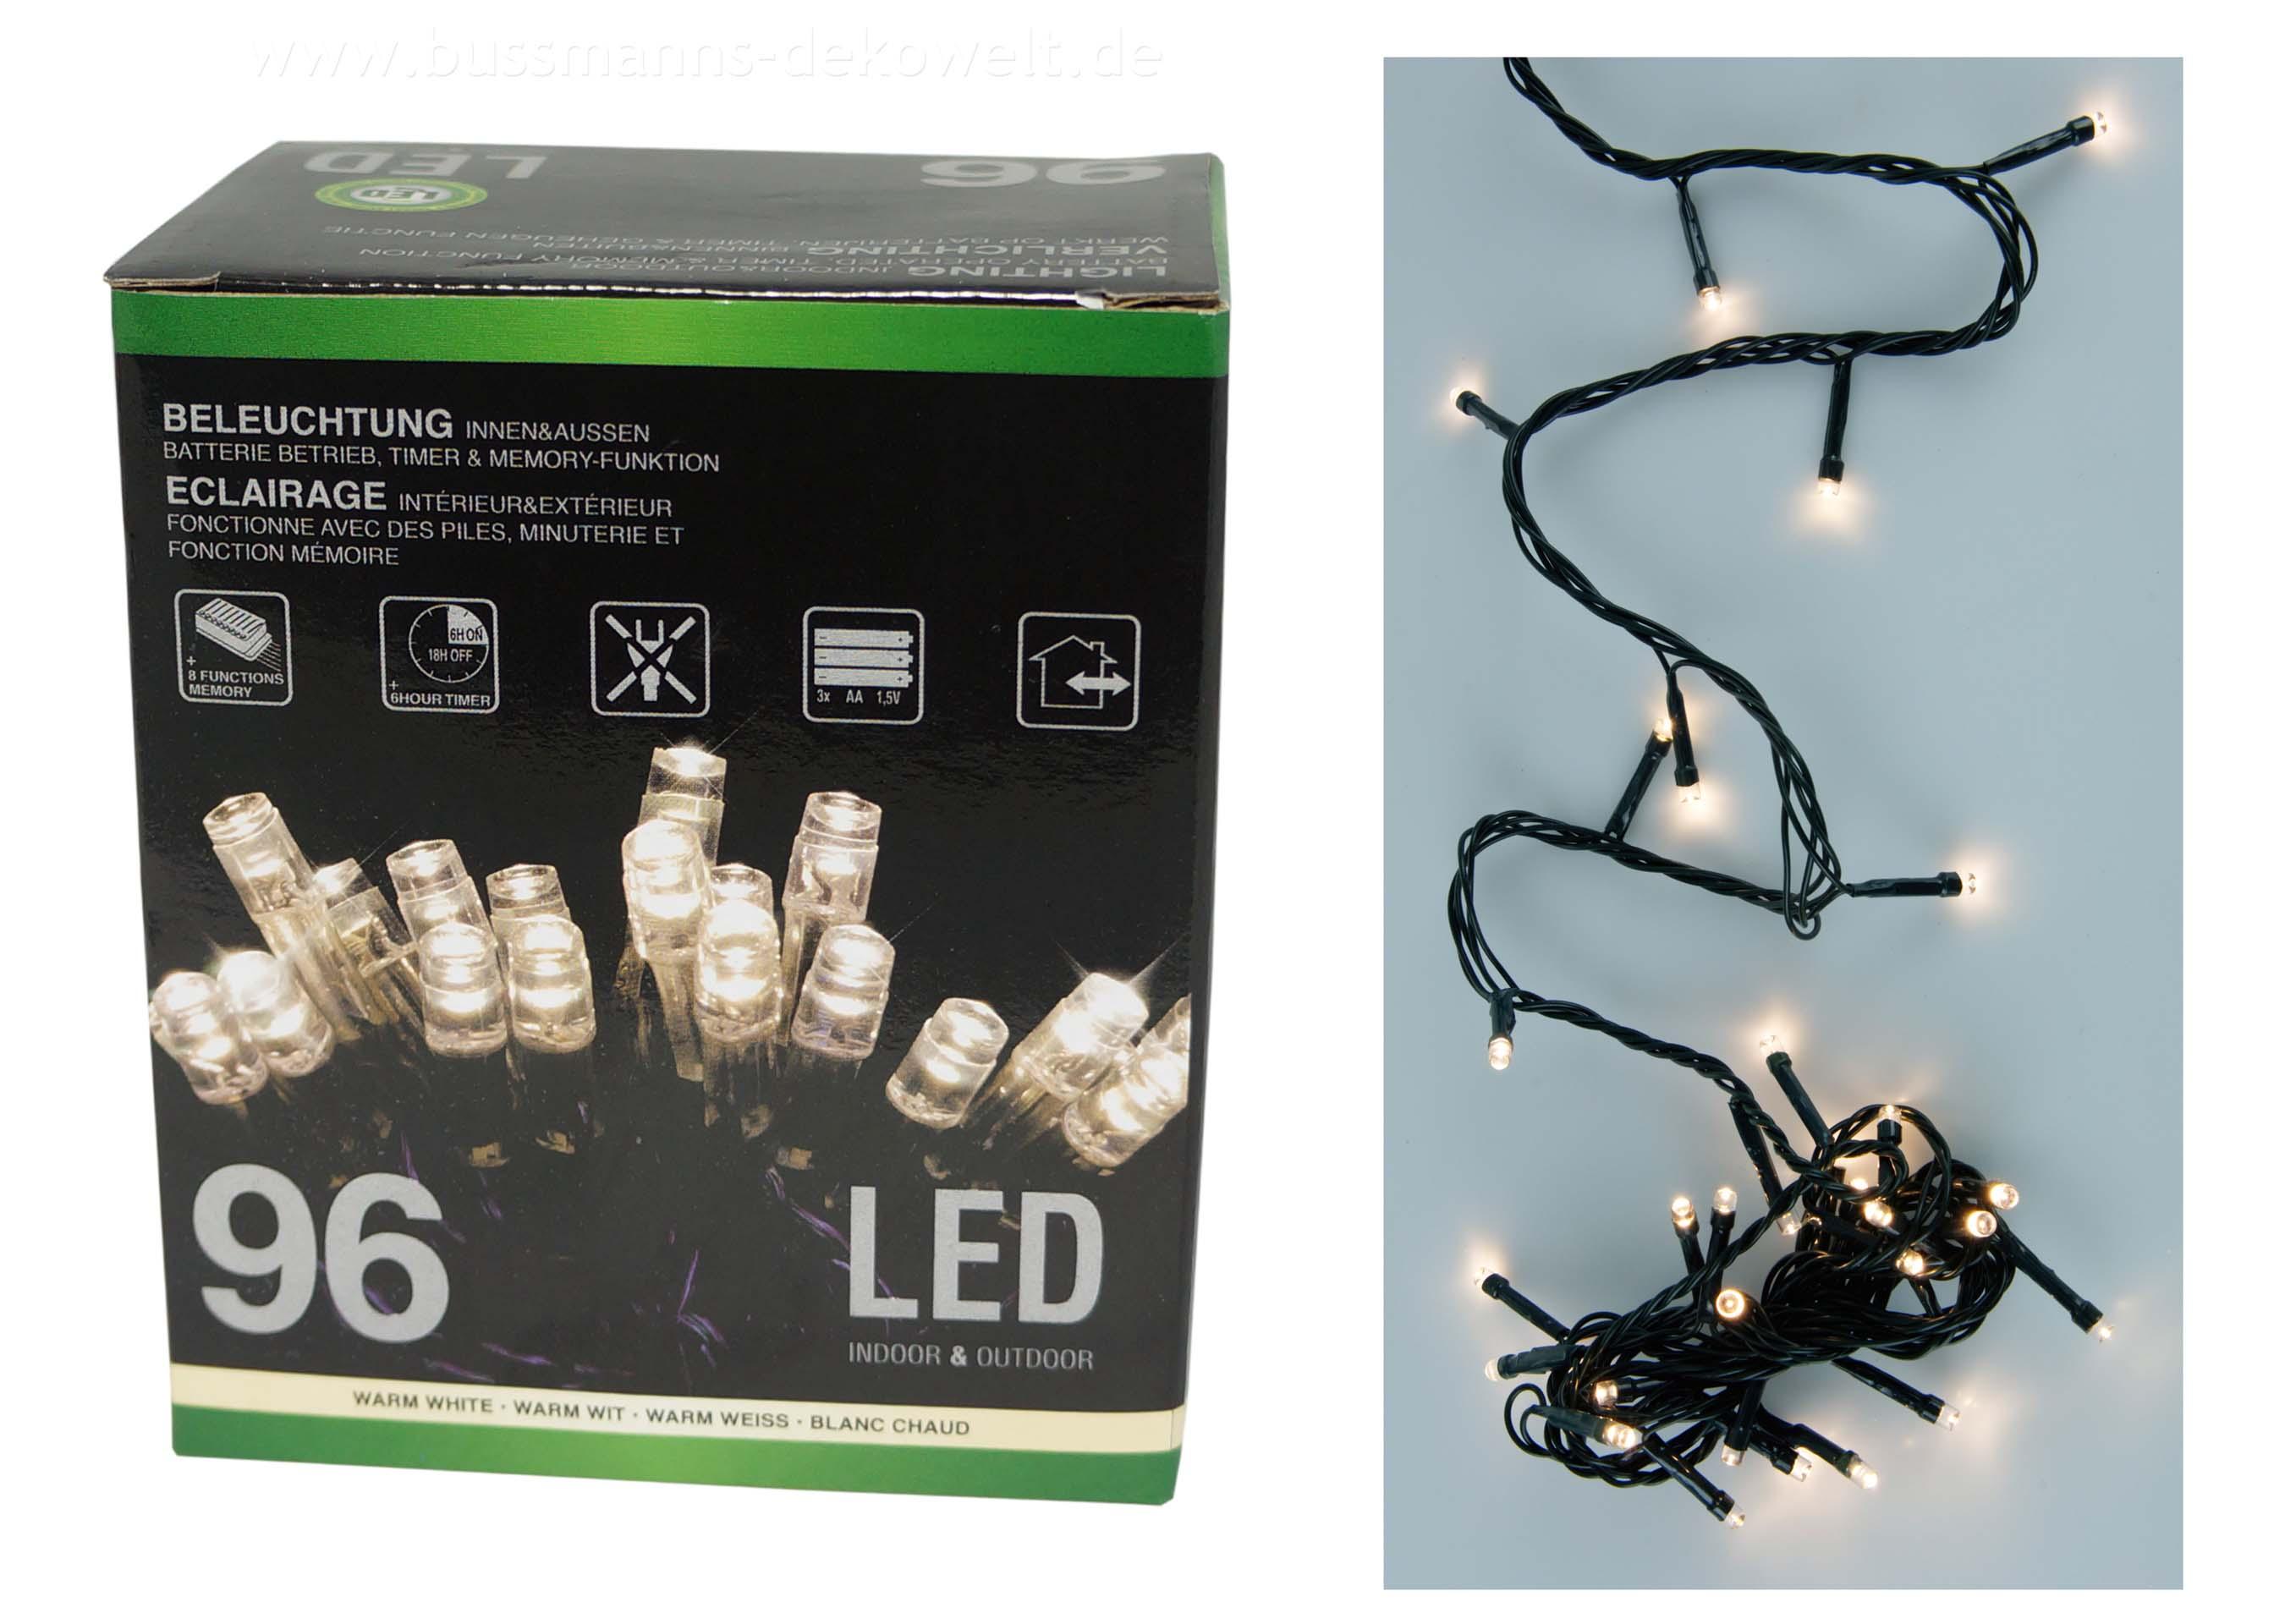 4x led lichterkette 96 leds warmwei batterie timer weihnachten innen au en ebay. Black Bedroom Furniture Sets. Home Design Ideas